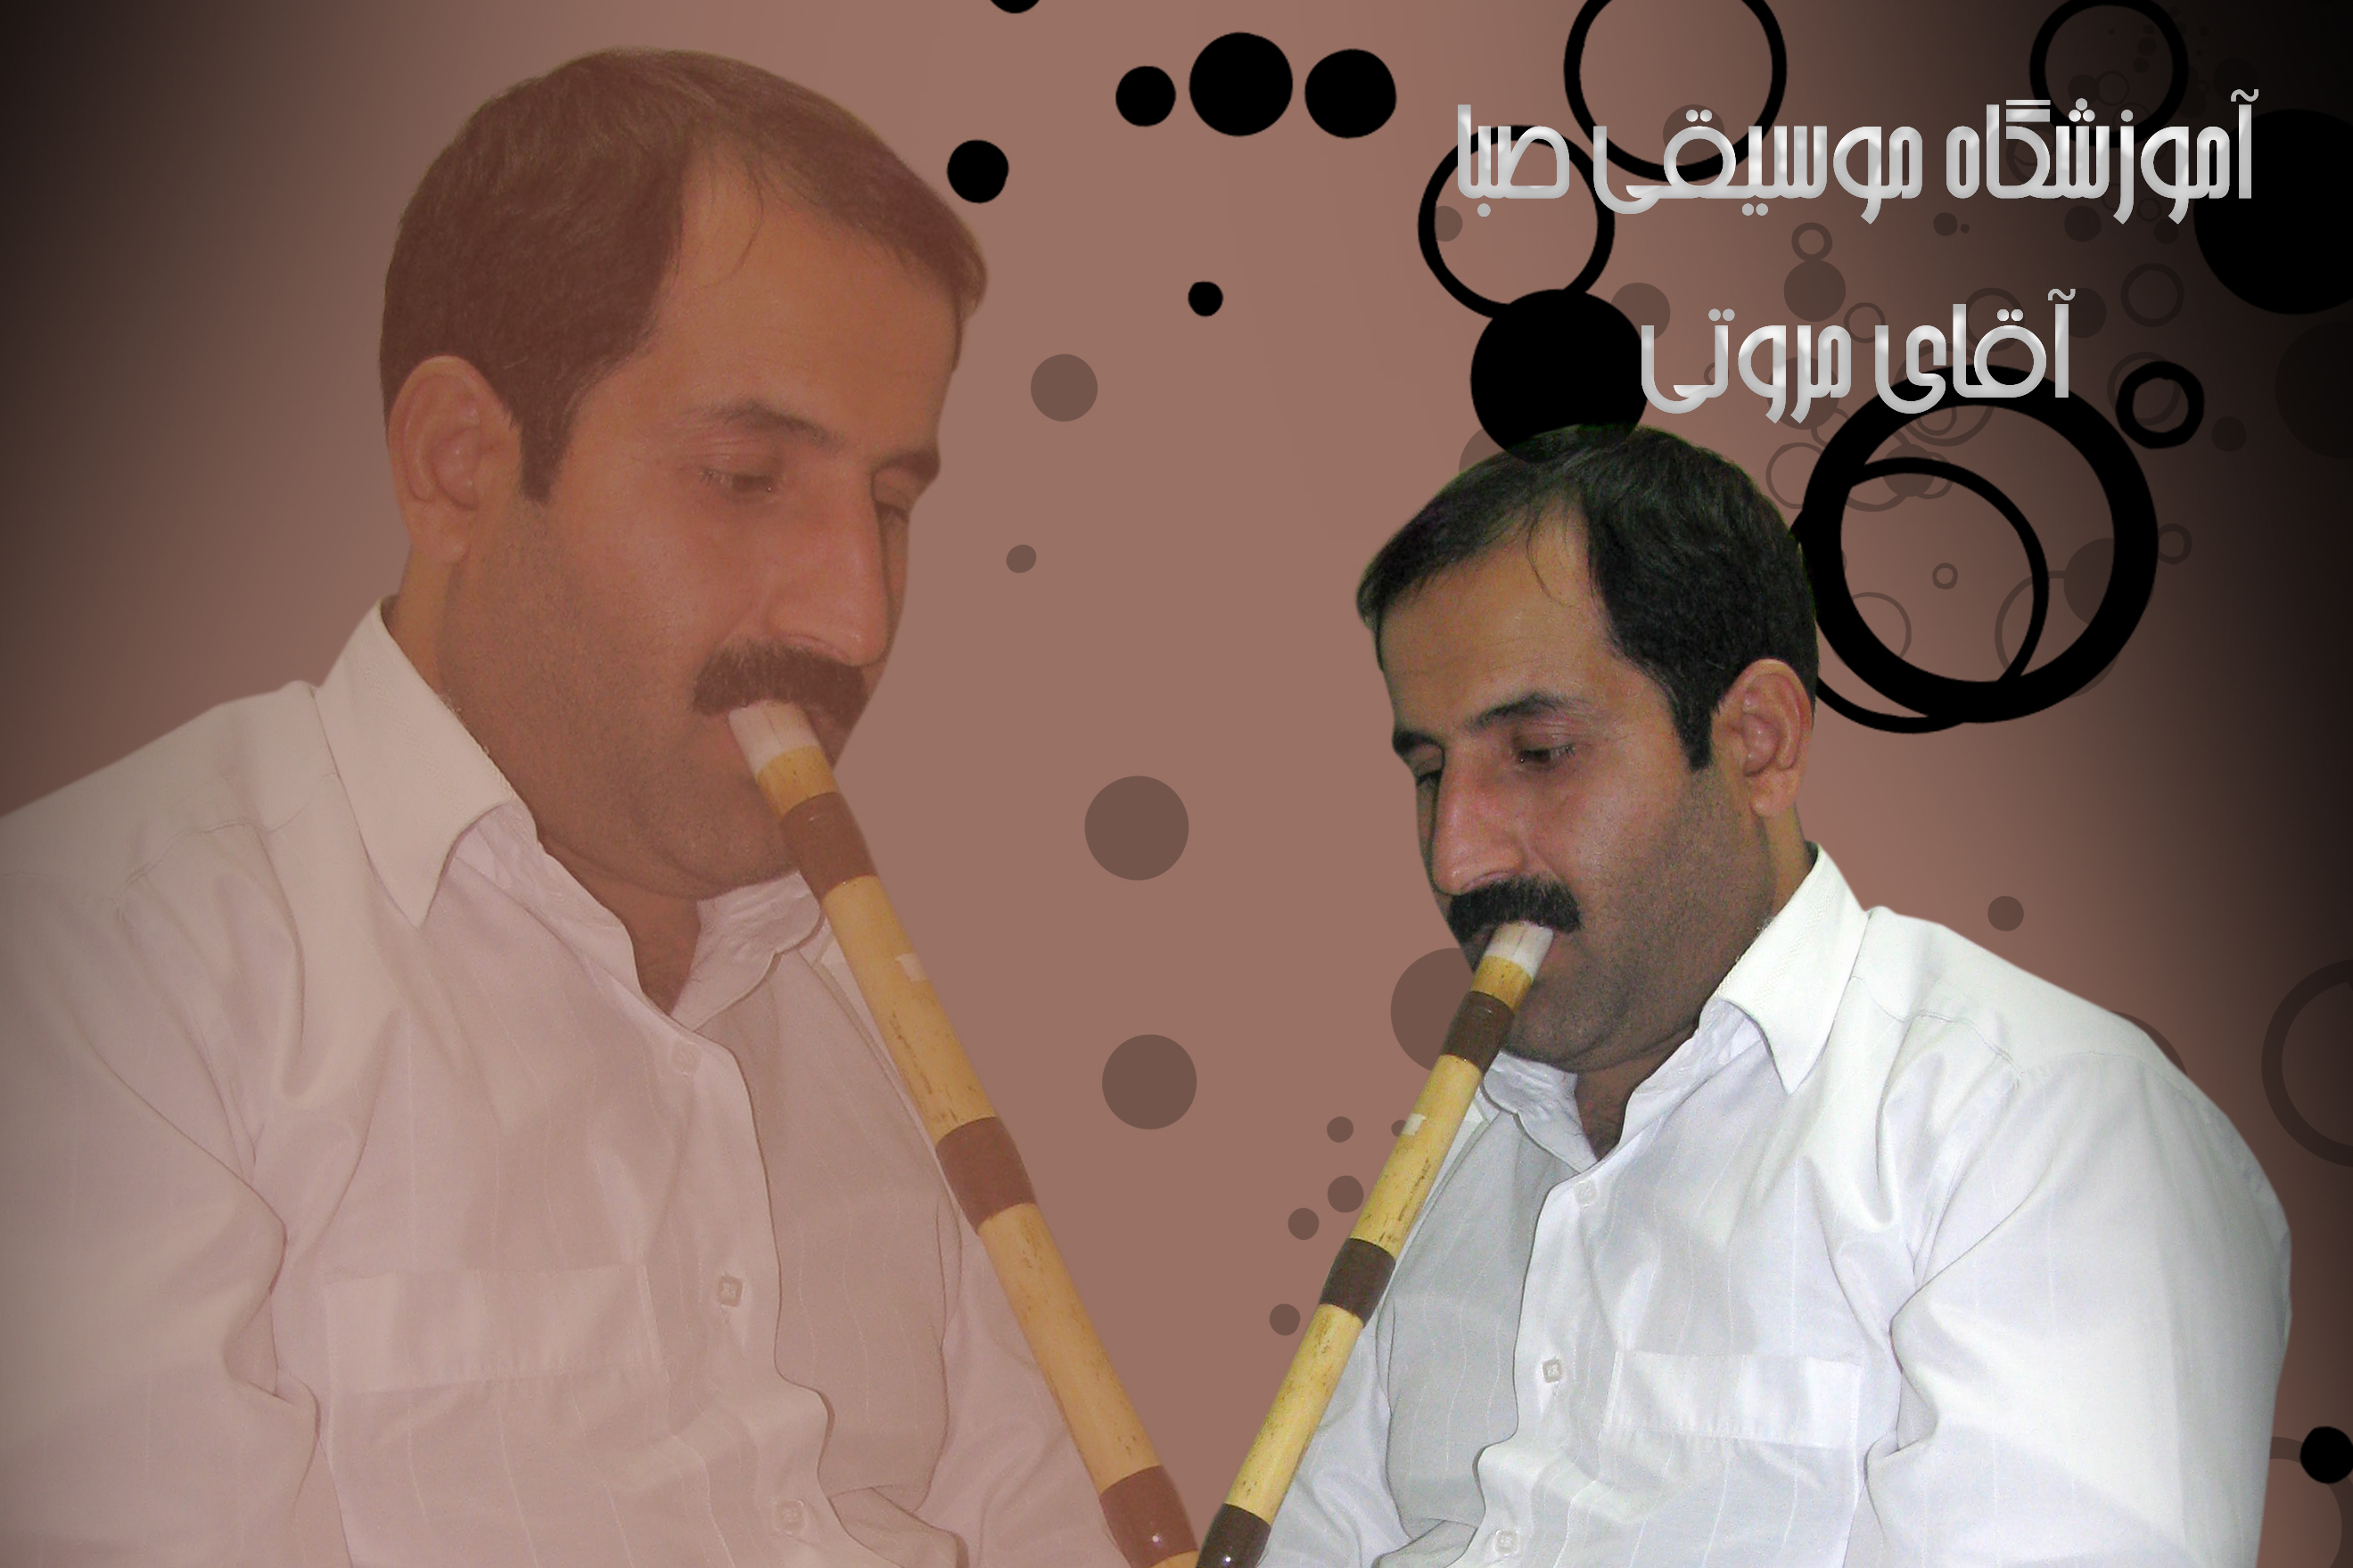 http://sabamusic79.persiangig.com/image/1%20%288%29.jpg